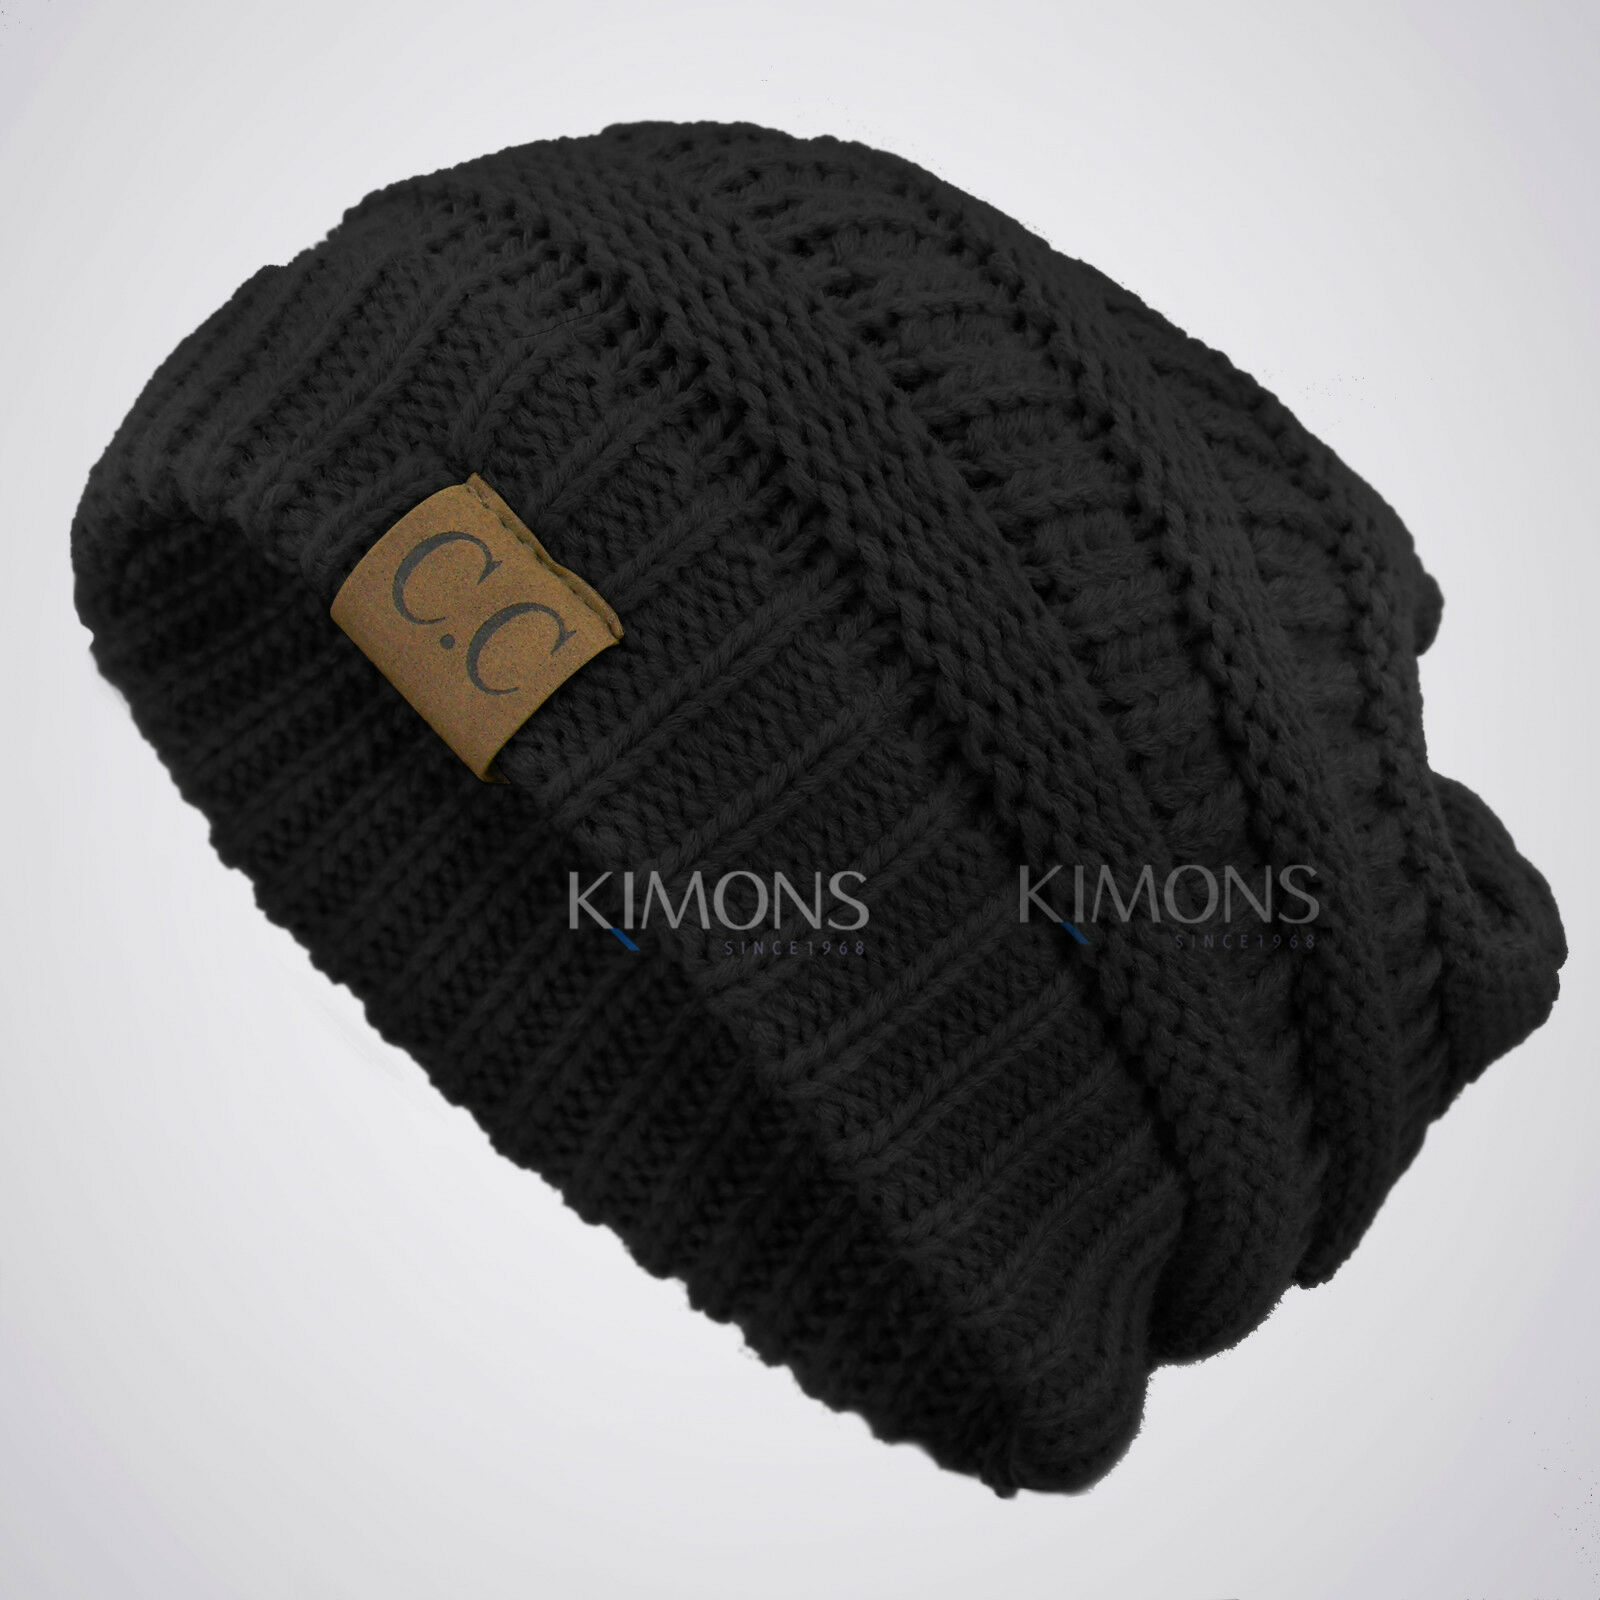 1825102c4d4 Bubble Knit Slouchy CC Baggy Beanie Oversize Winter Hat Ski Cap Skull Women